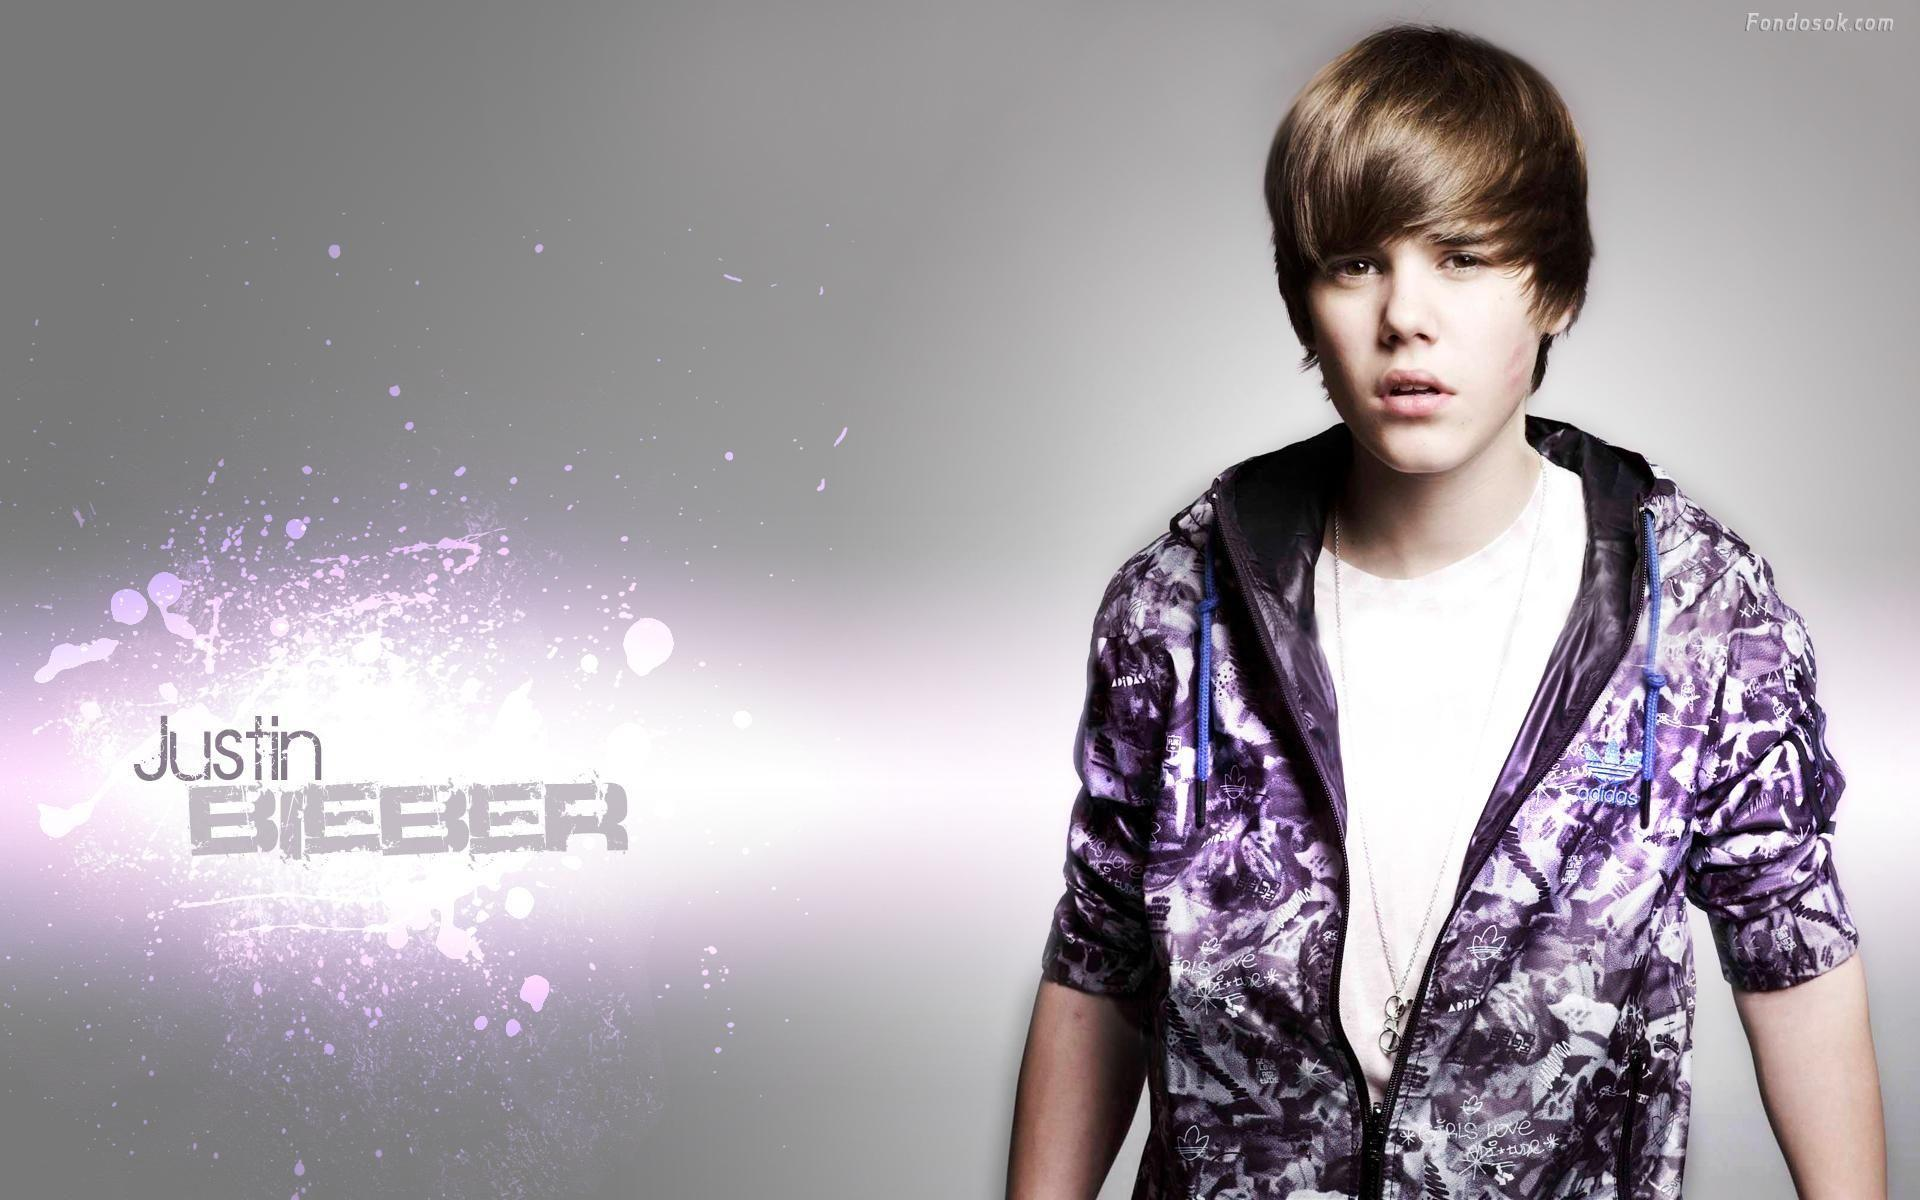 Wallpaper download justin bieber - Justin Bieber 2015 Wallpapers Wallpaper Cave Download